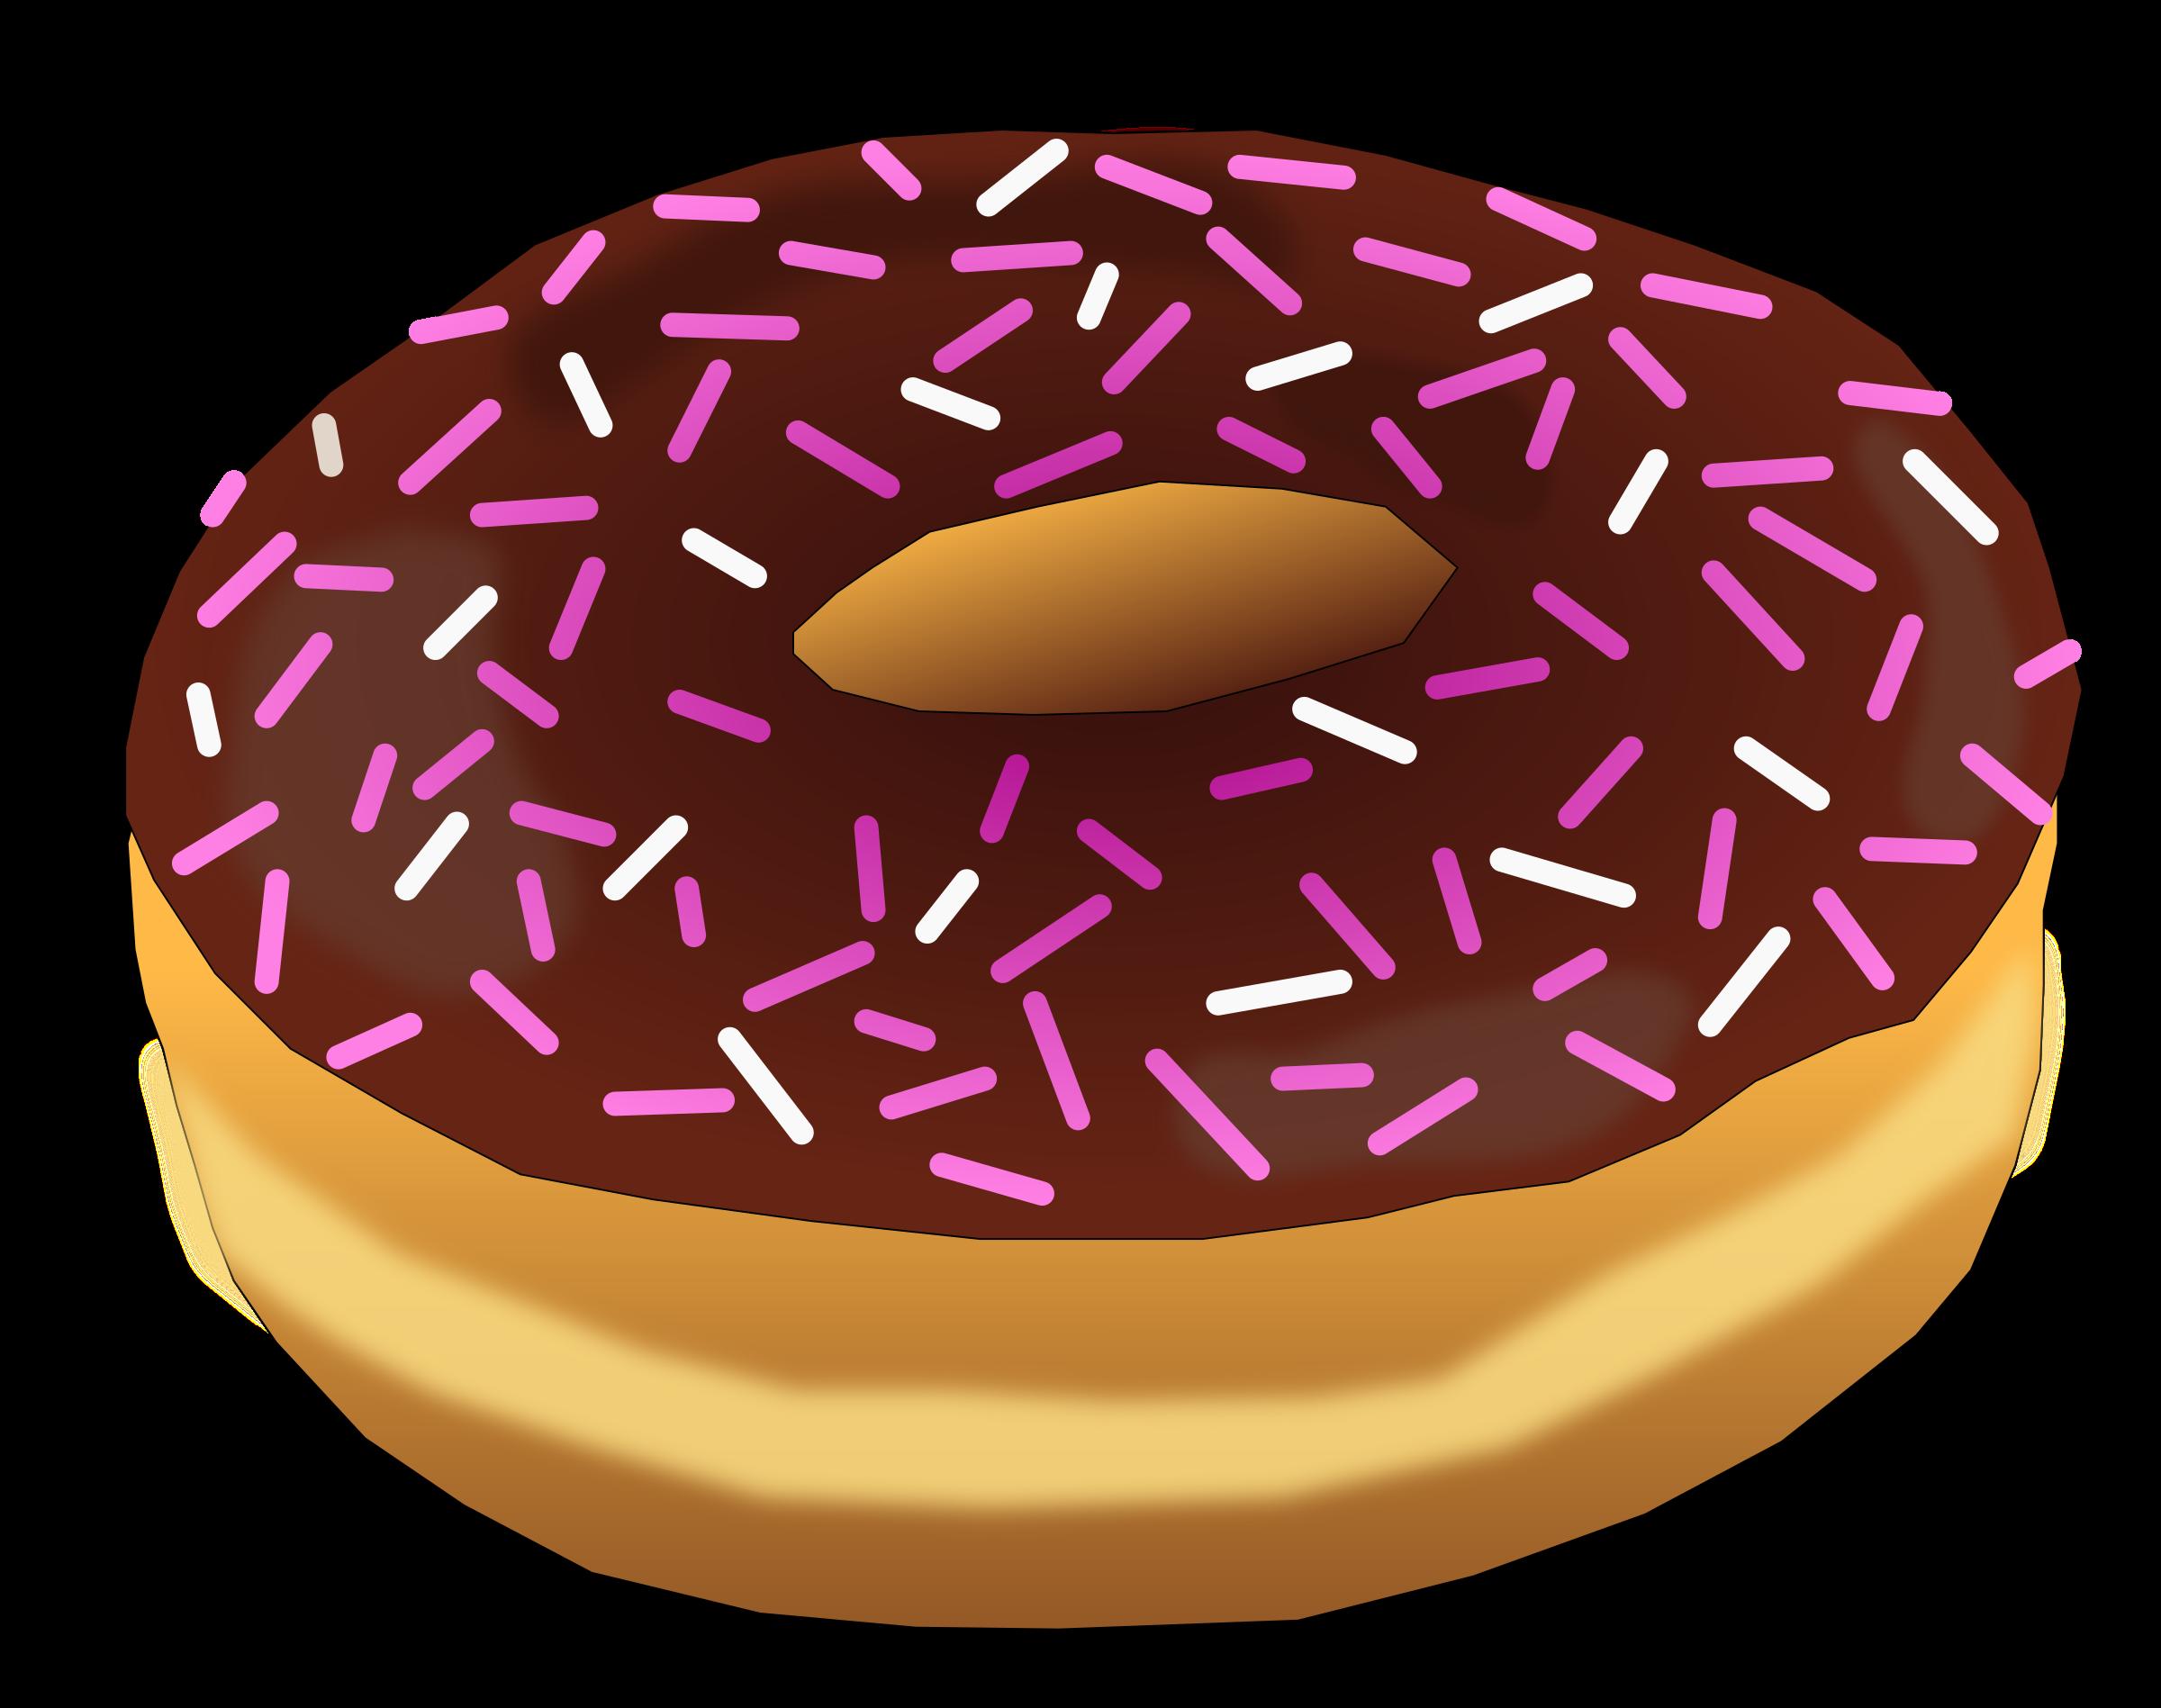 Big image png. Donut clipart pink donut